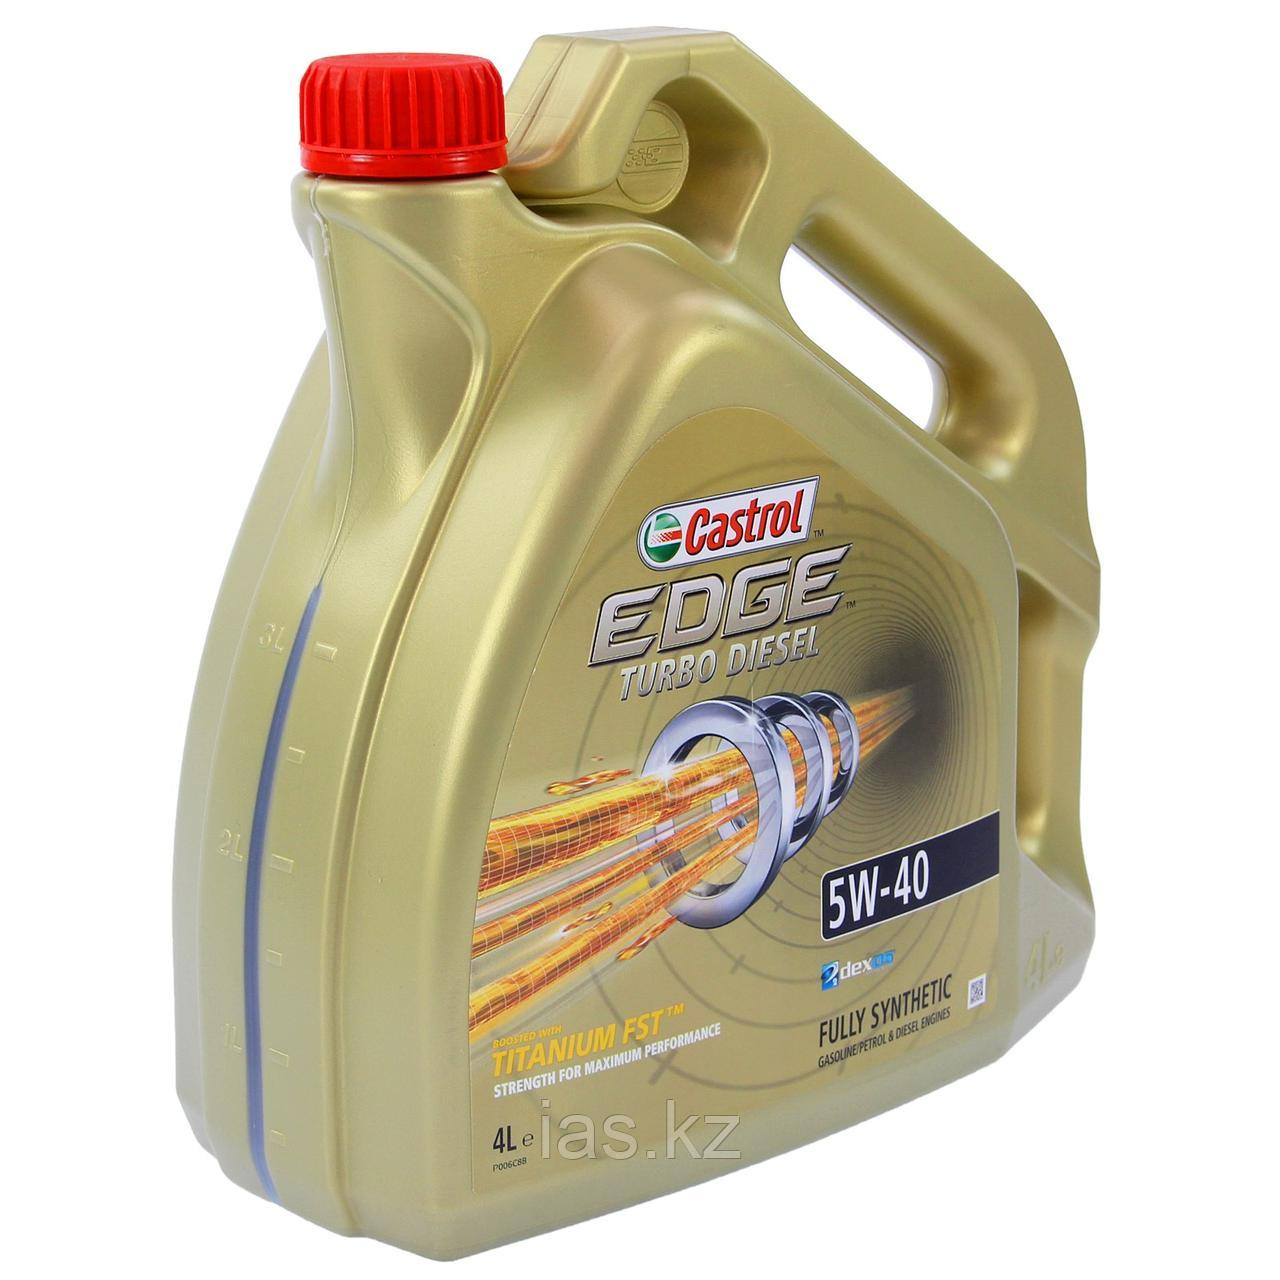 Моторное масло CASTROL EDGE Turbo Diesel 5w40 4 литра